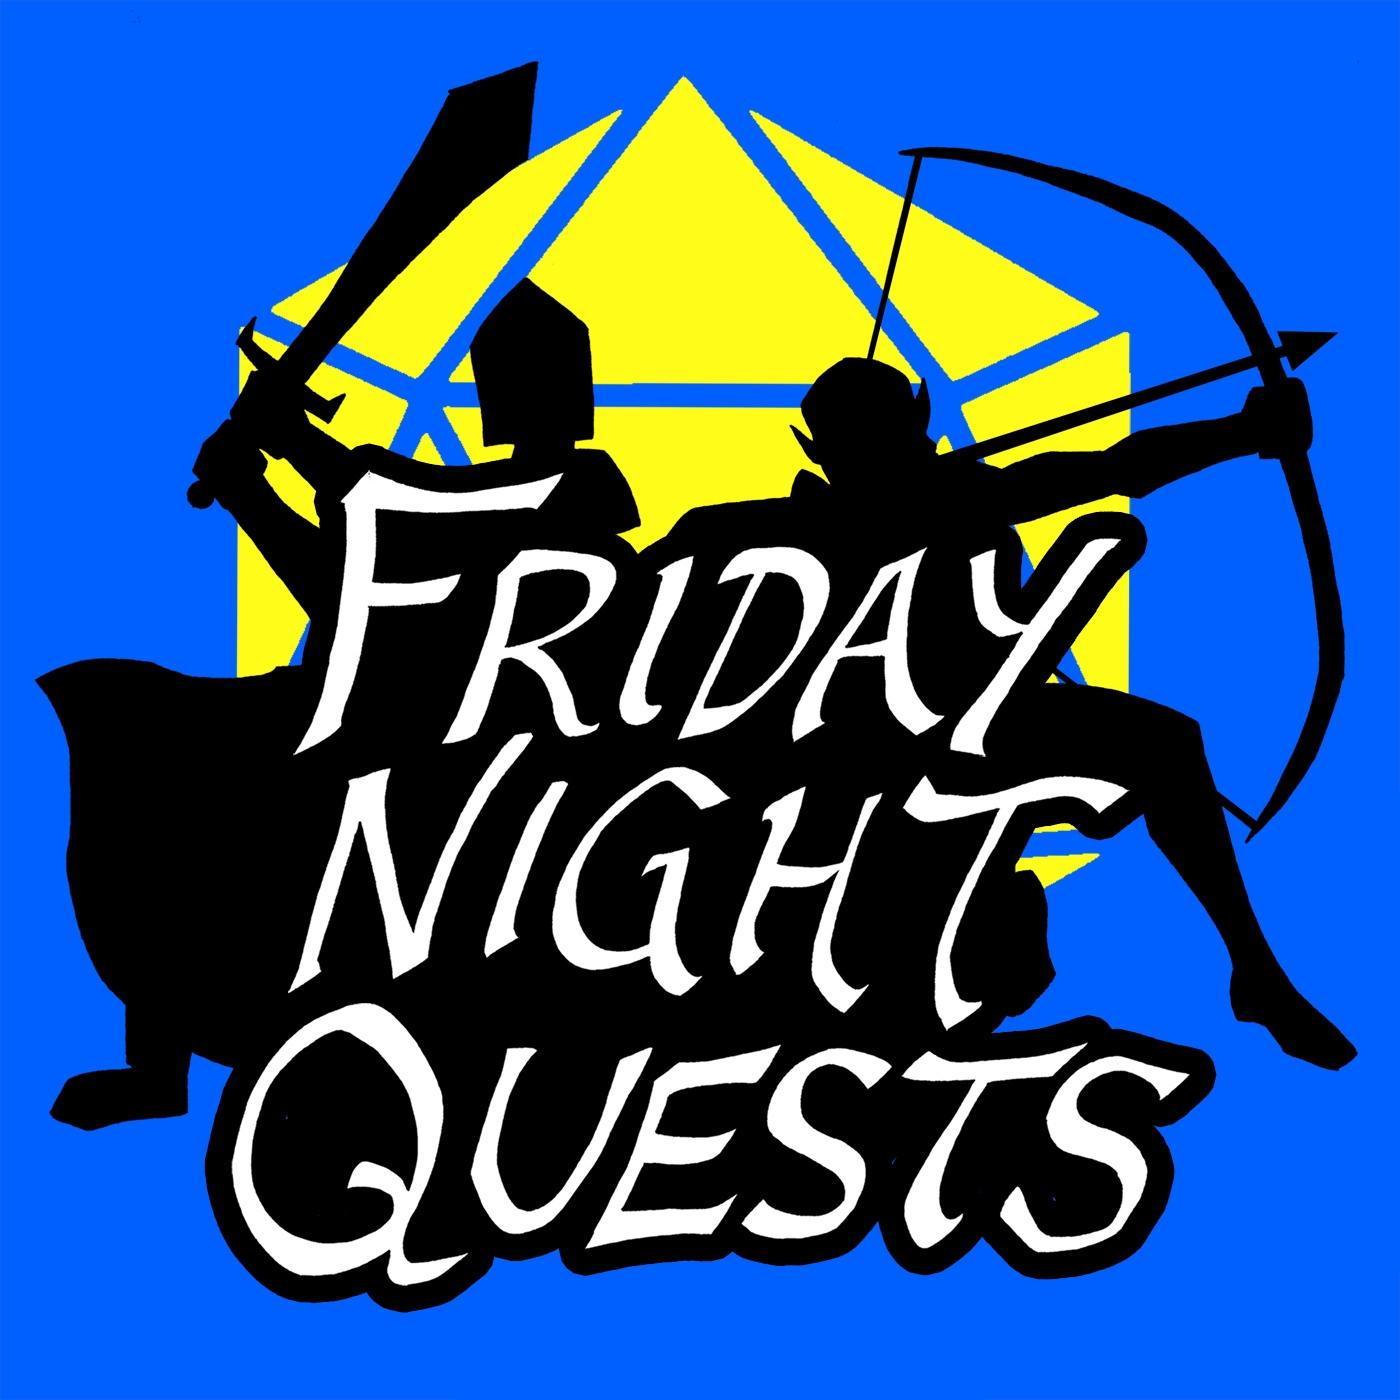 Friday_Night_Quests_Logo_1400x1400_under_500kb.jpg